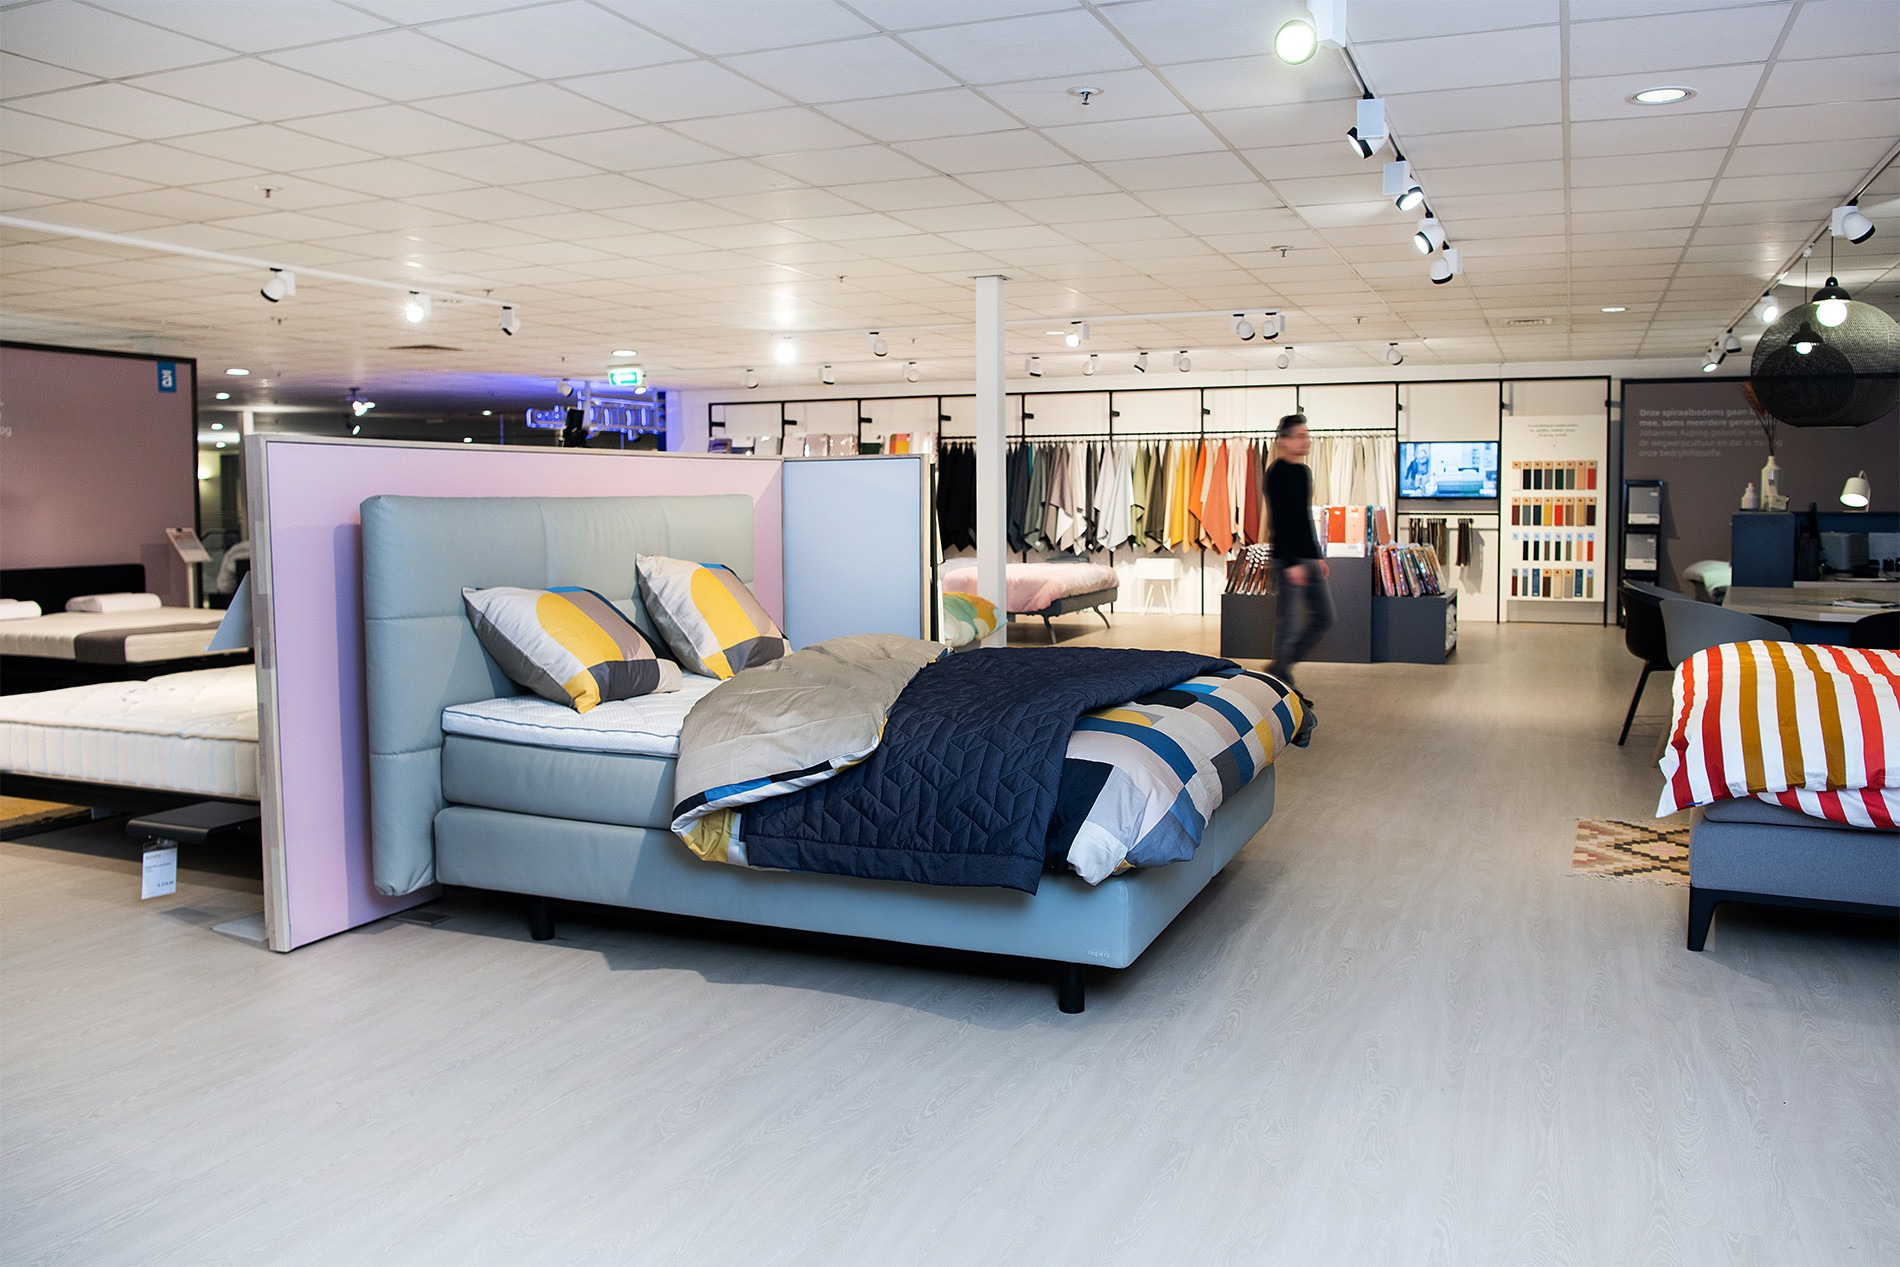 Auping collectie bedden in Groningen